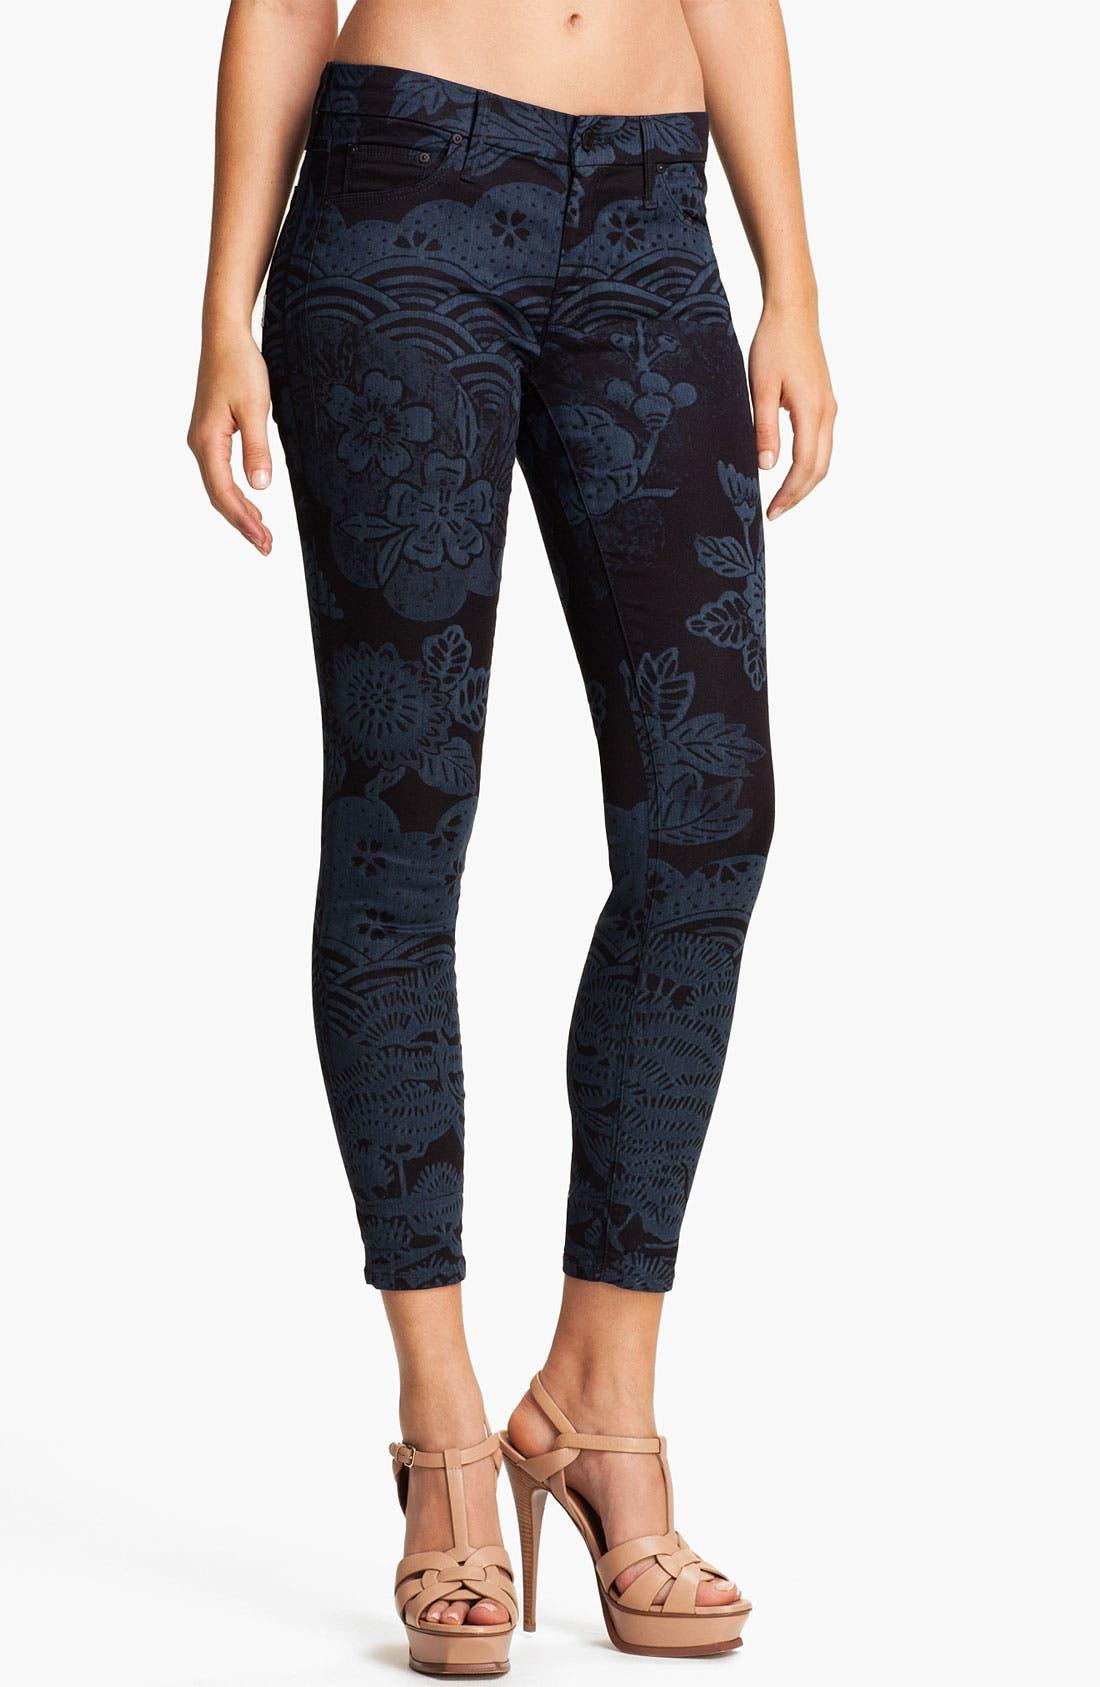 Alternate Image 1 Selected - MOTHER 'The Looker' Print Skinny Crop Jeans (Moon of Tokyo)